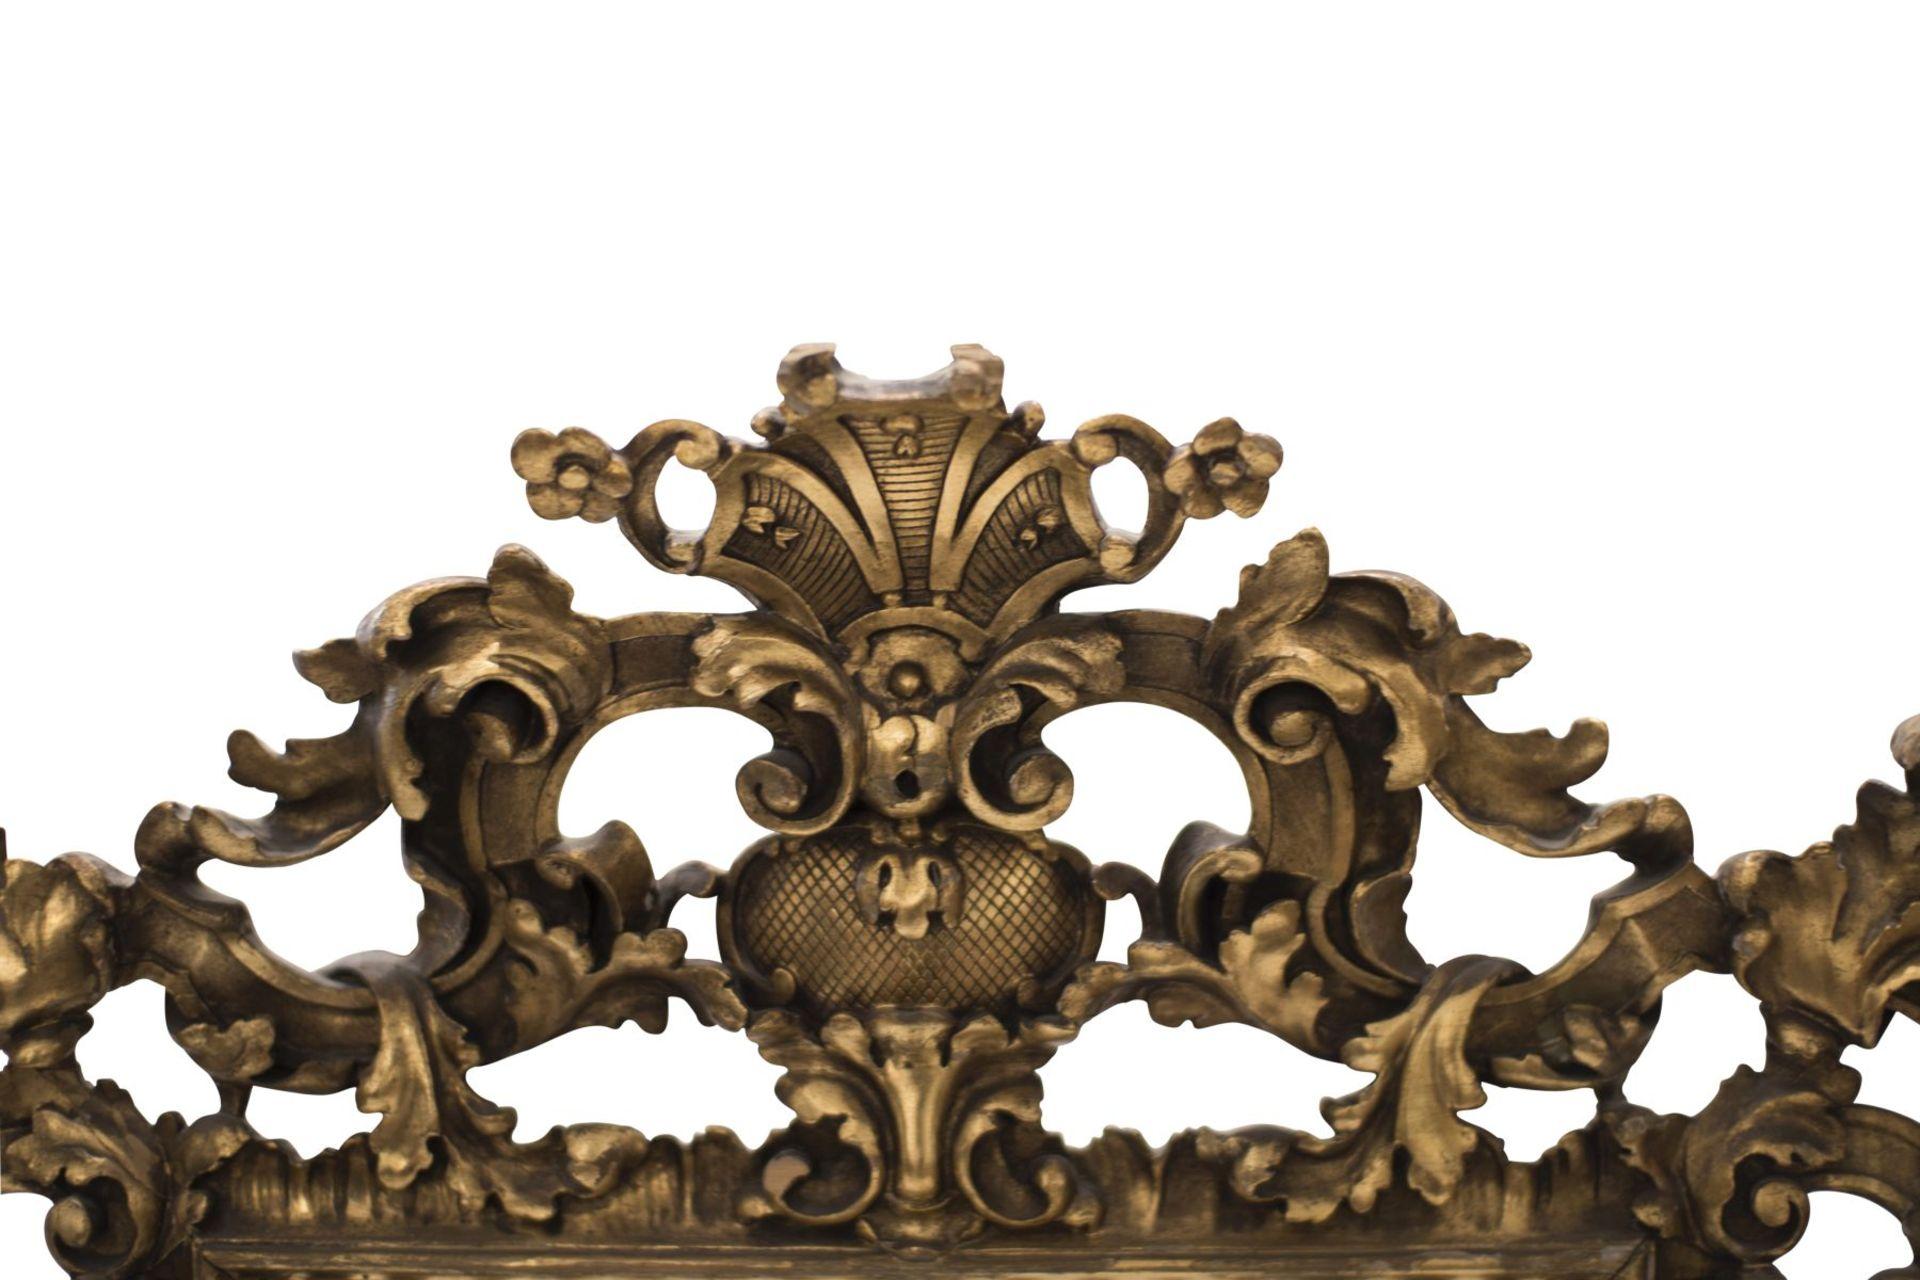 Baroque style salon mirror, 19th century - Image 3 of 6